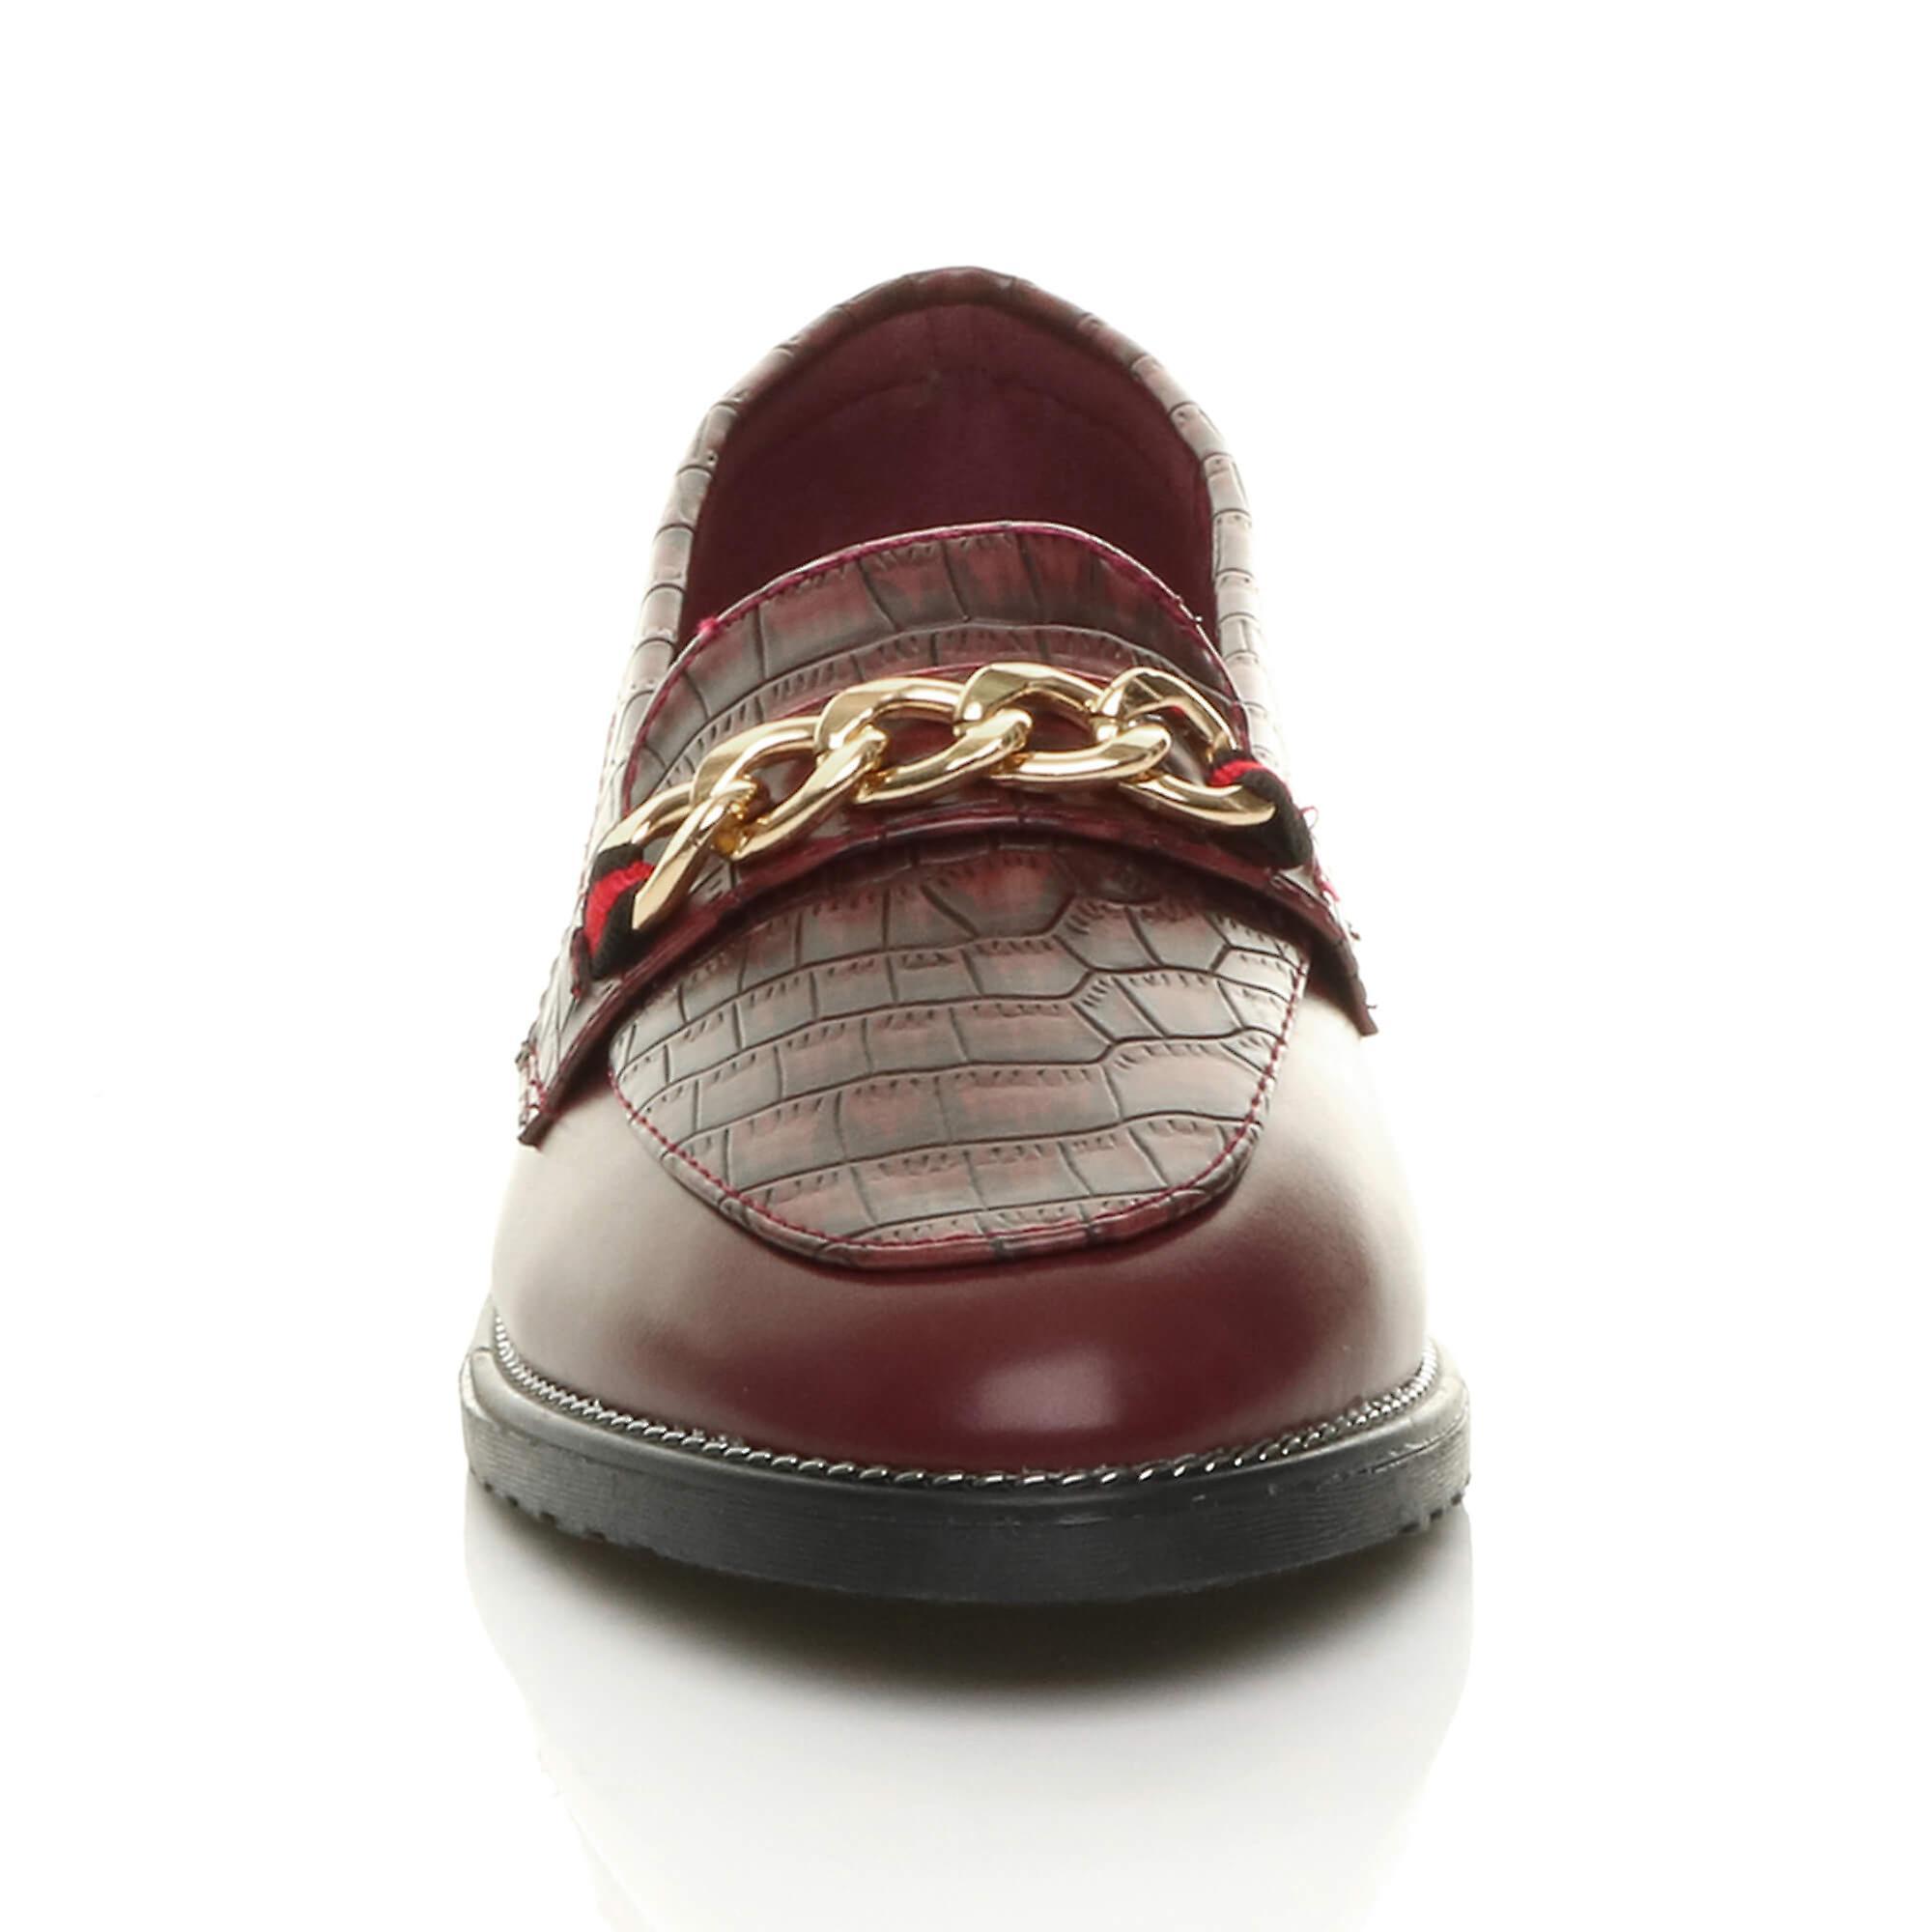 Ajvani Womens Flat Low Heel Slip On Smart Casual Loafers Work Shoes